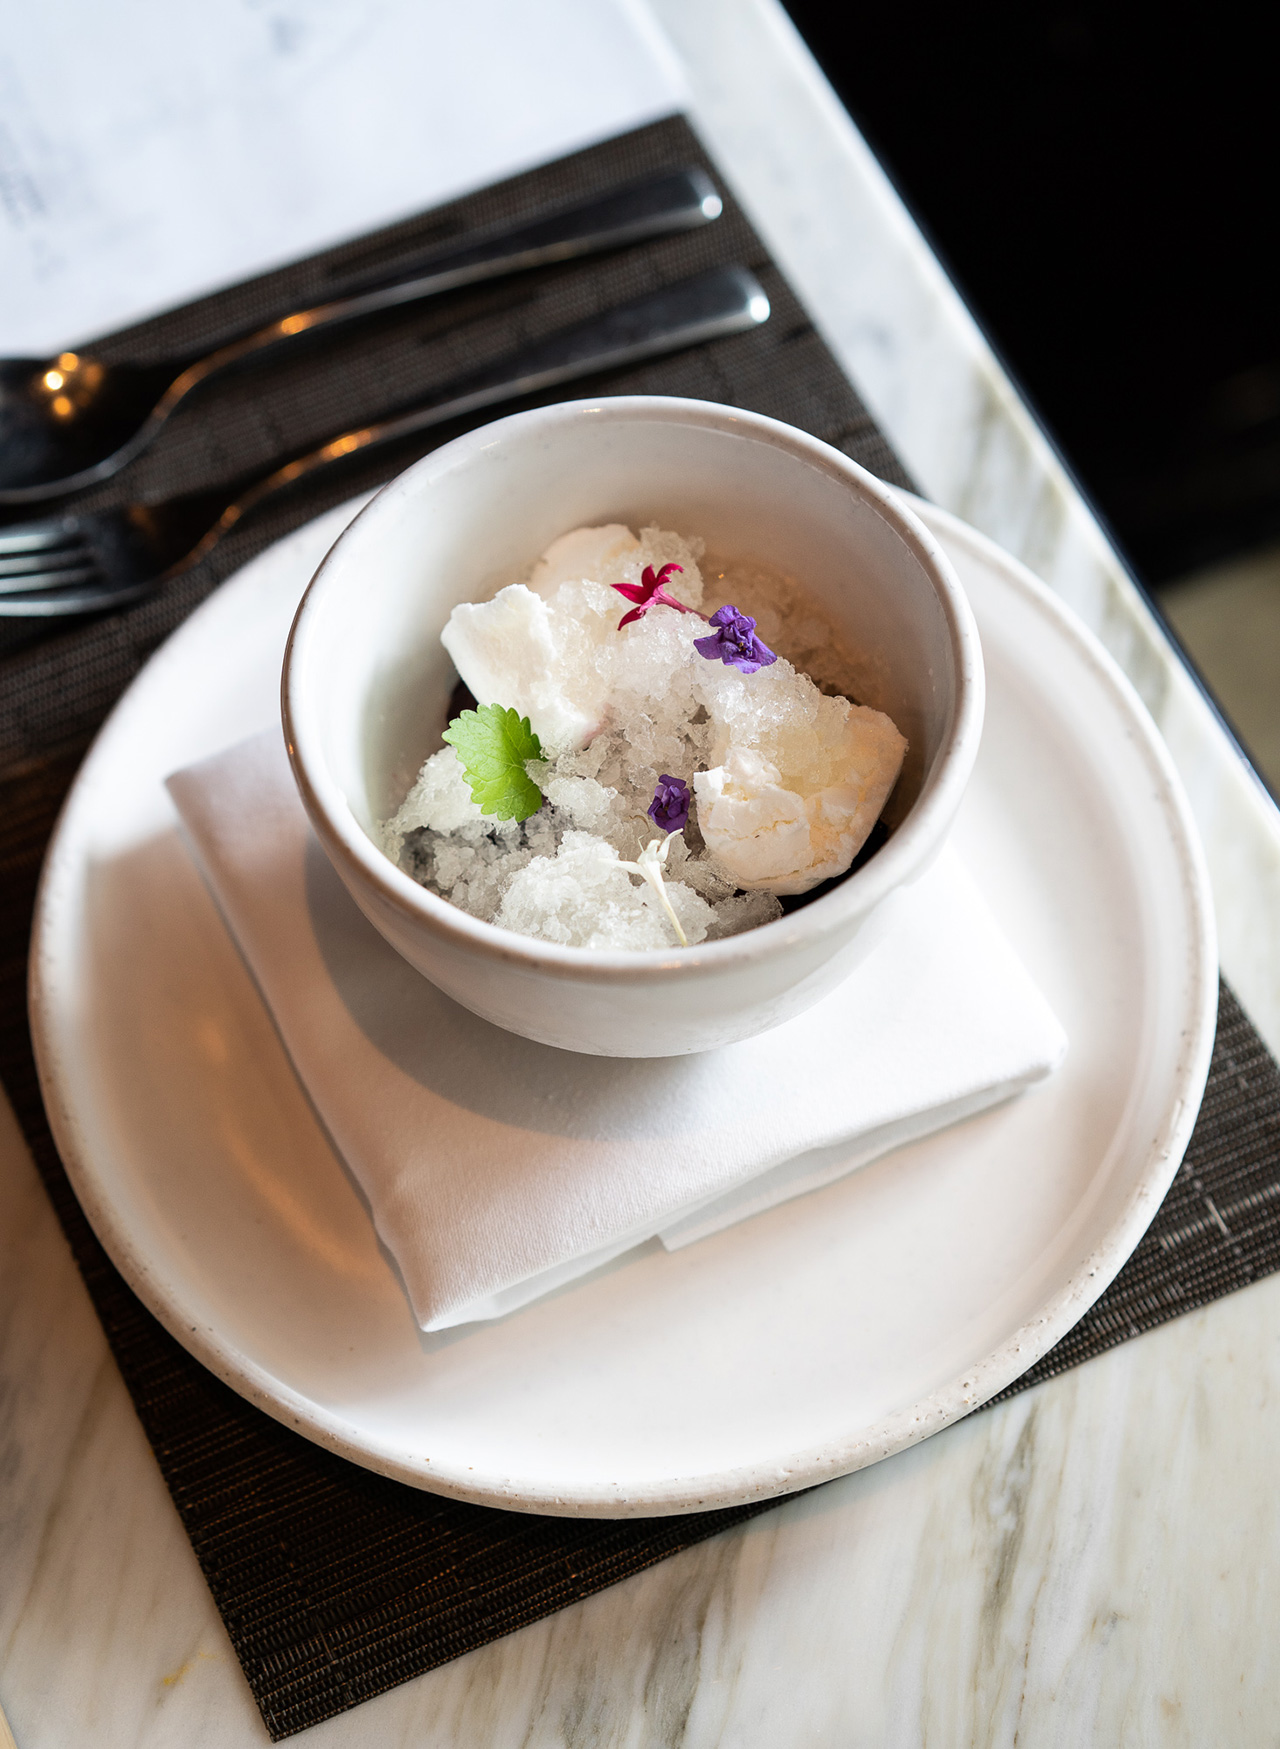 Elderflower with yogurt and summer fruit.